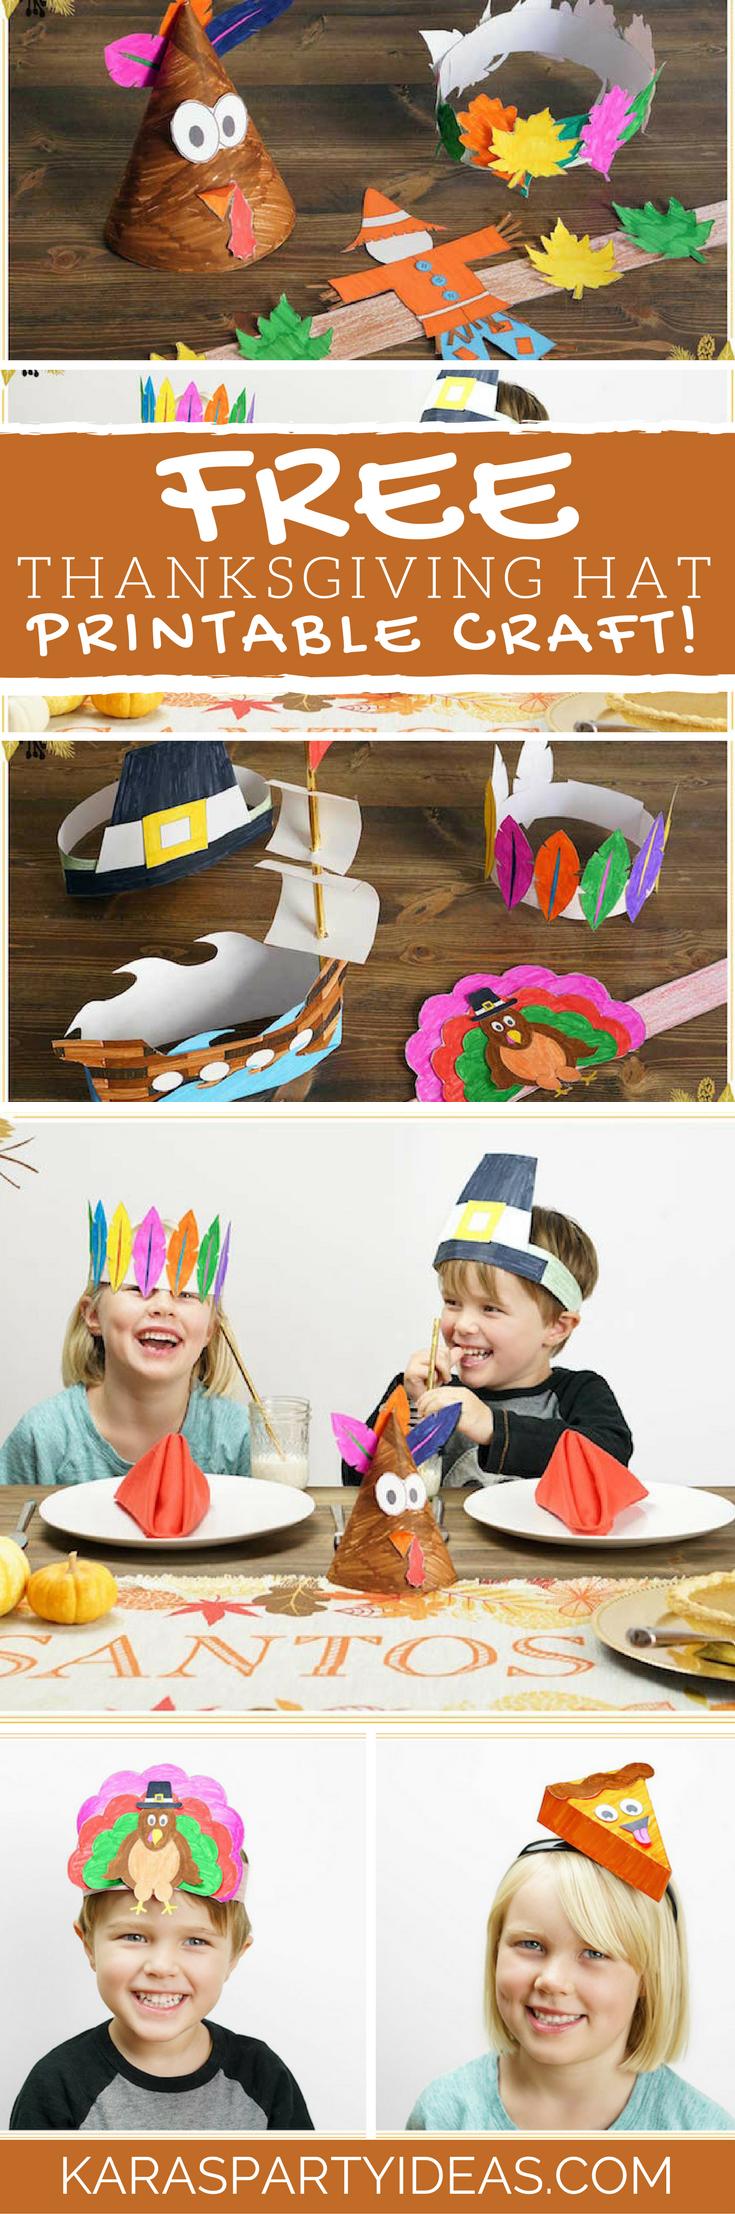 Free Thanksgiving Hat Printable Craft via Kara's Party Ideas - KarasPartyIdeas.com (1)